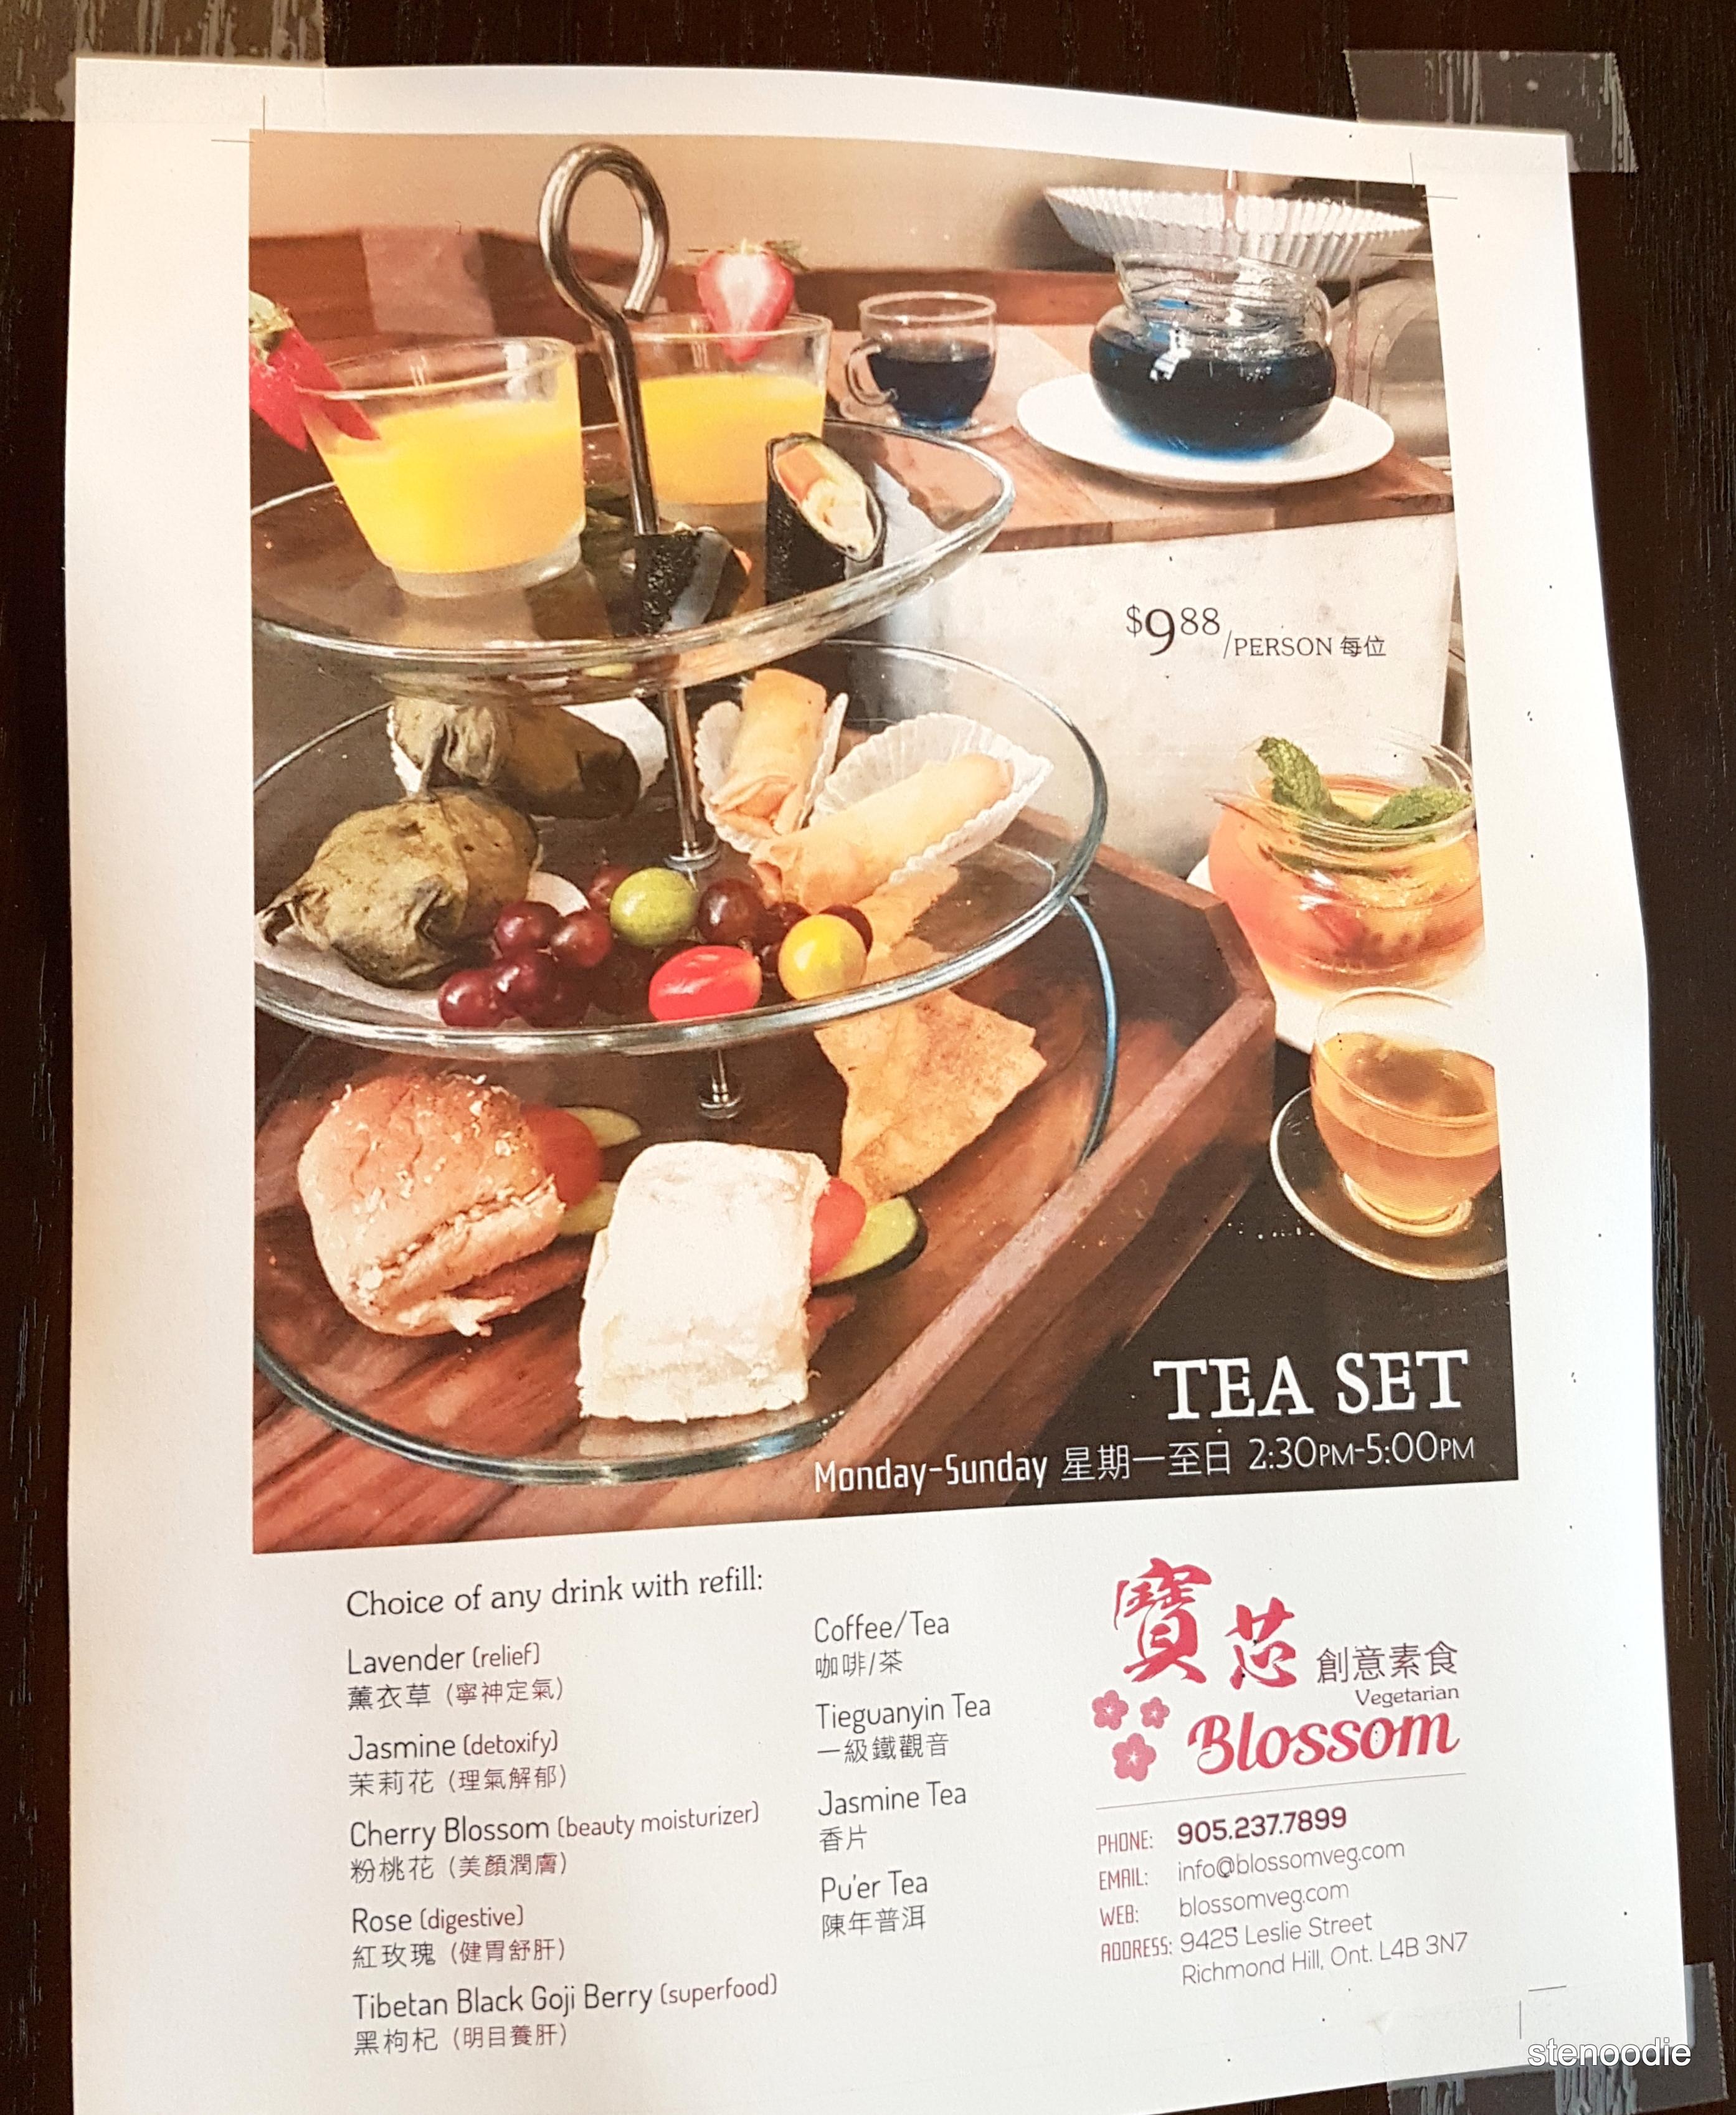 Blossom Vegetarian tea set prices